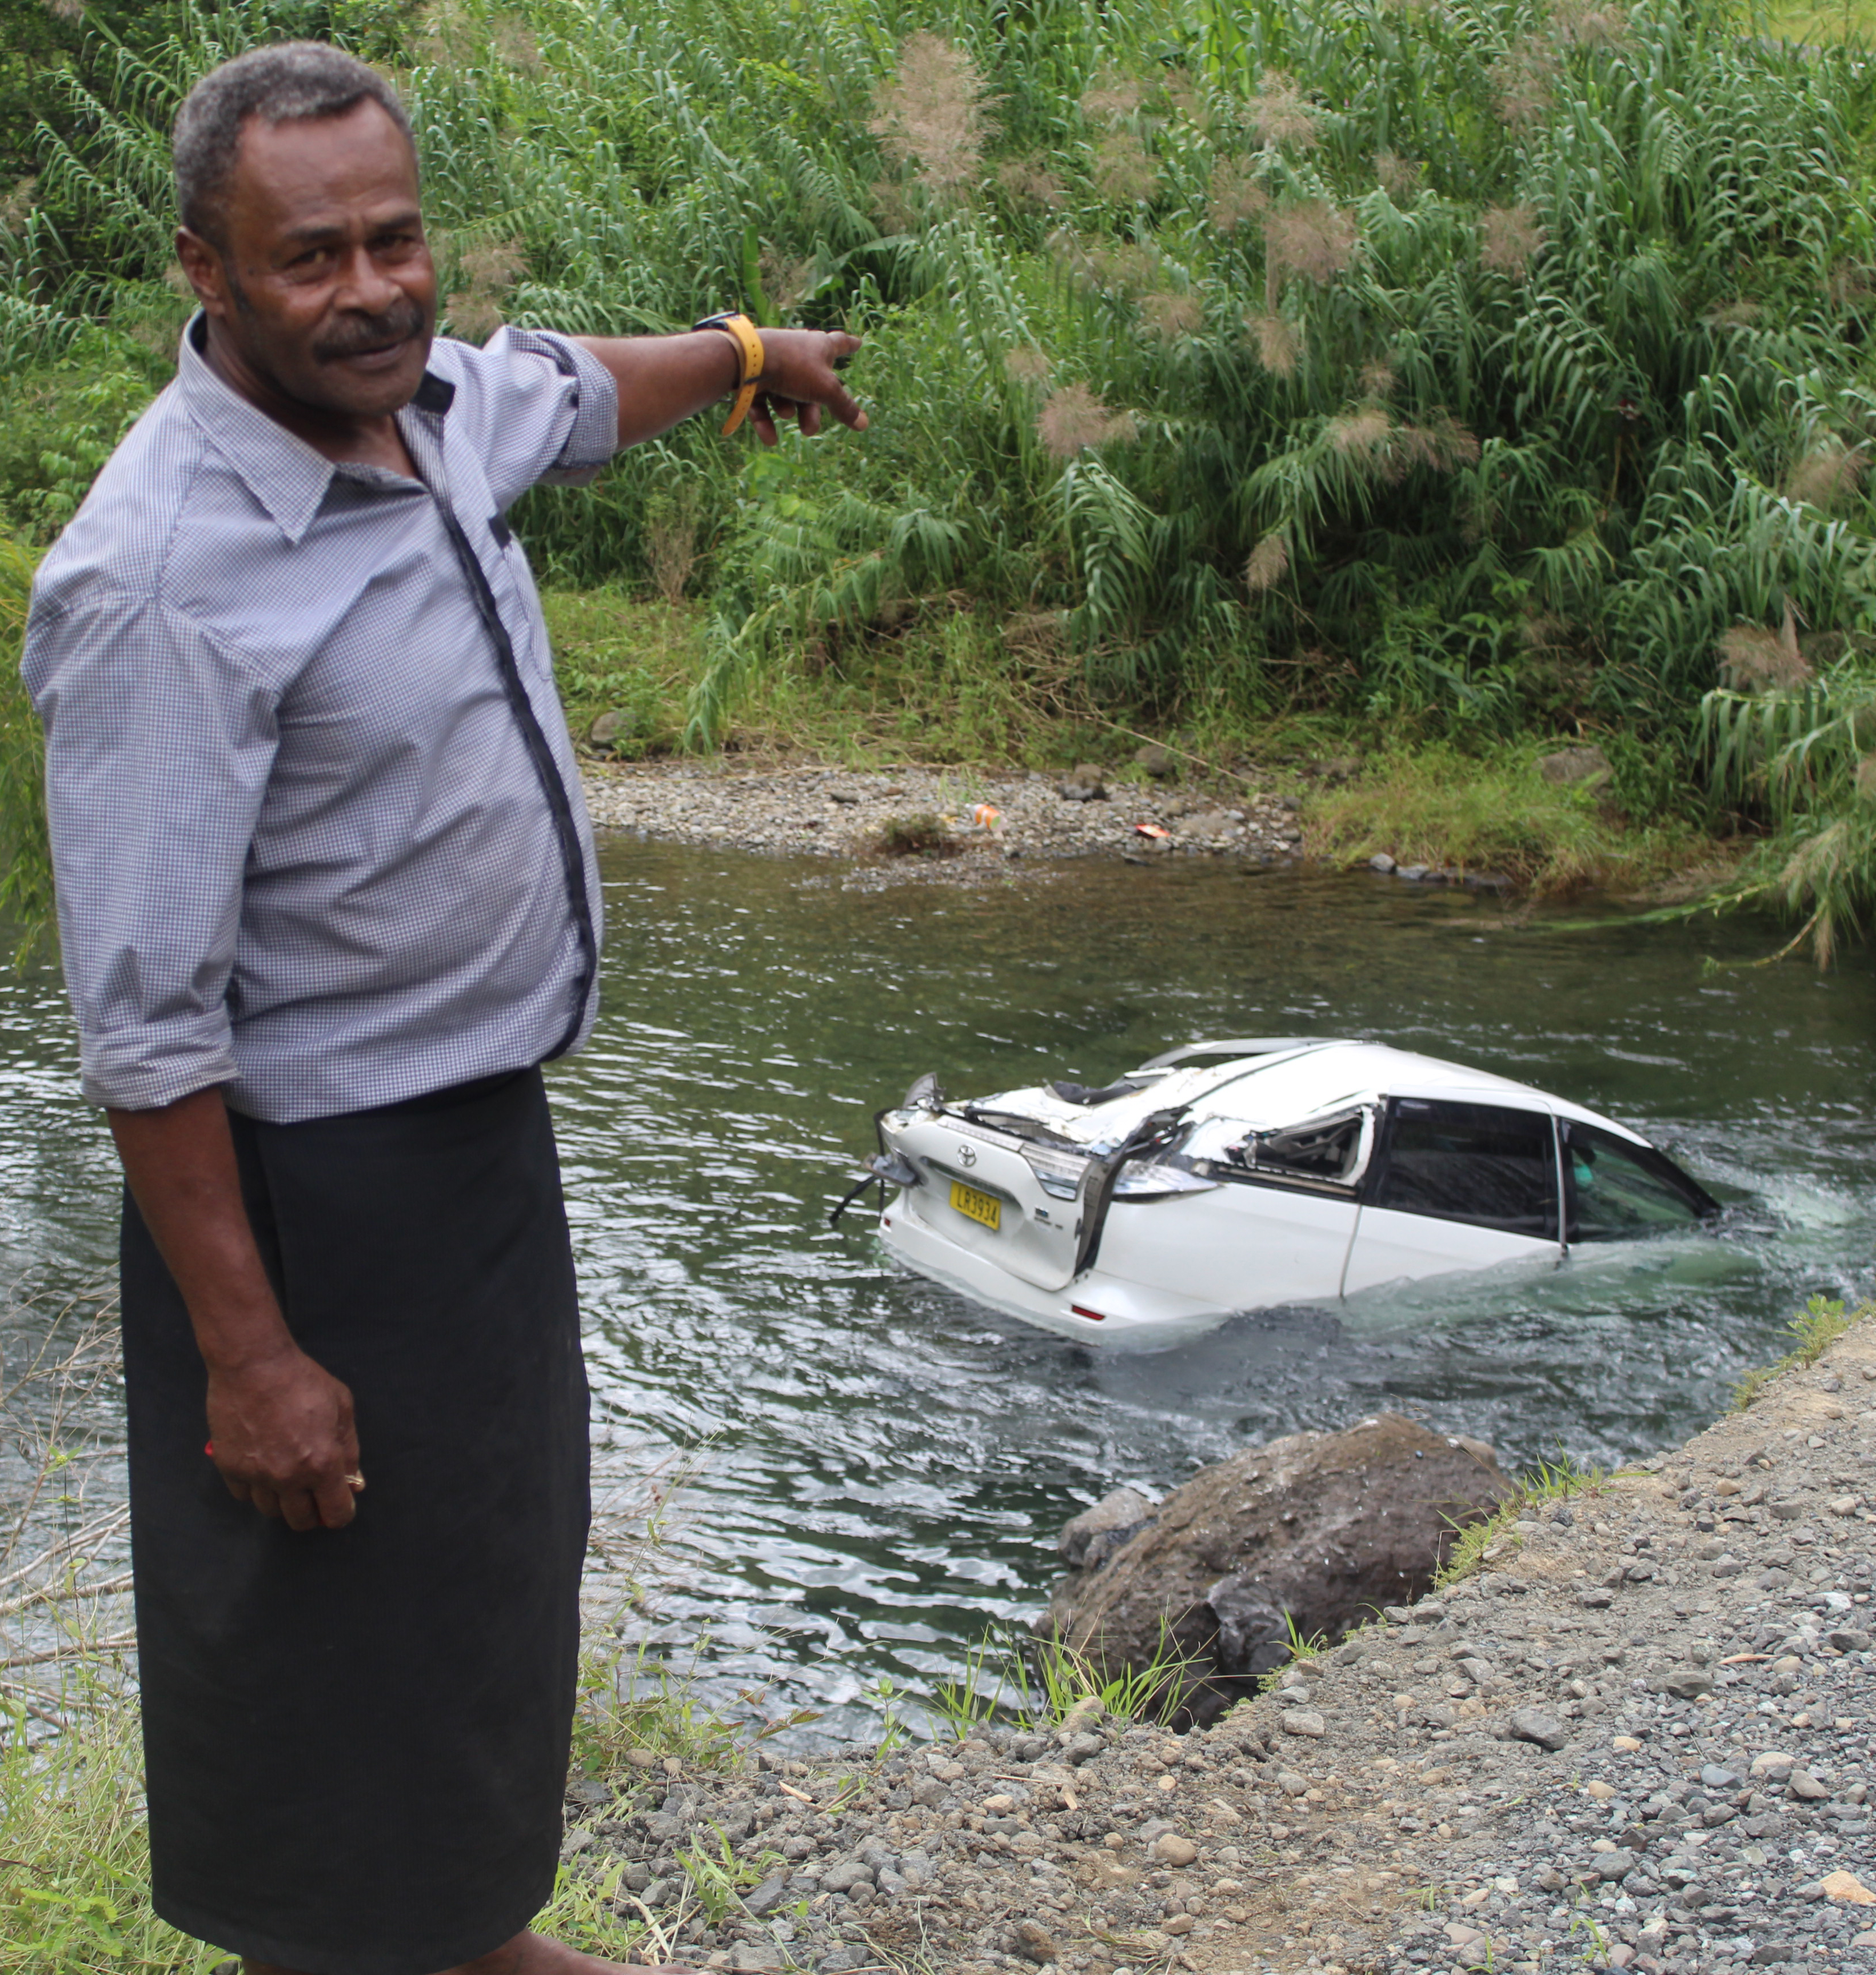 Farasiko Saunivalu points to the car that landed in a river near Namosi Village on April 15, 2018. Photo: Selita Bolanavanua